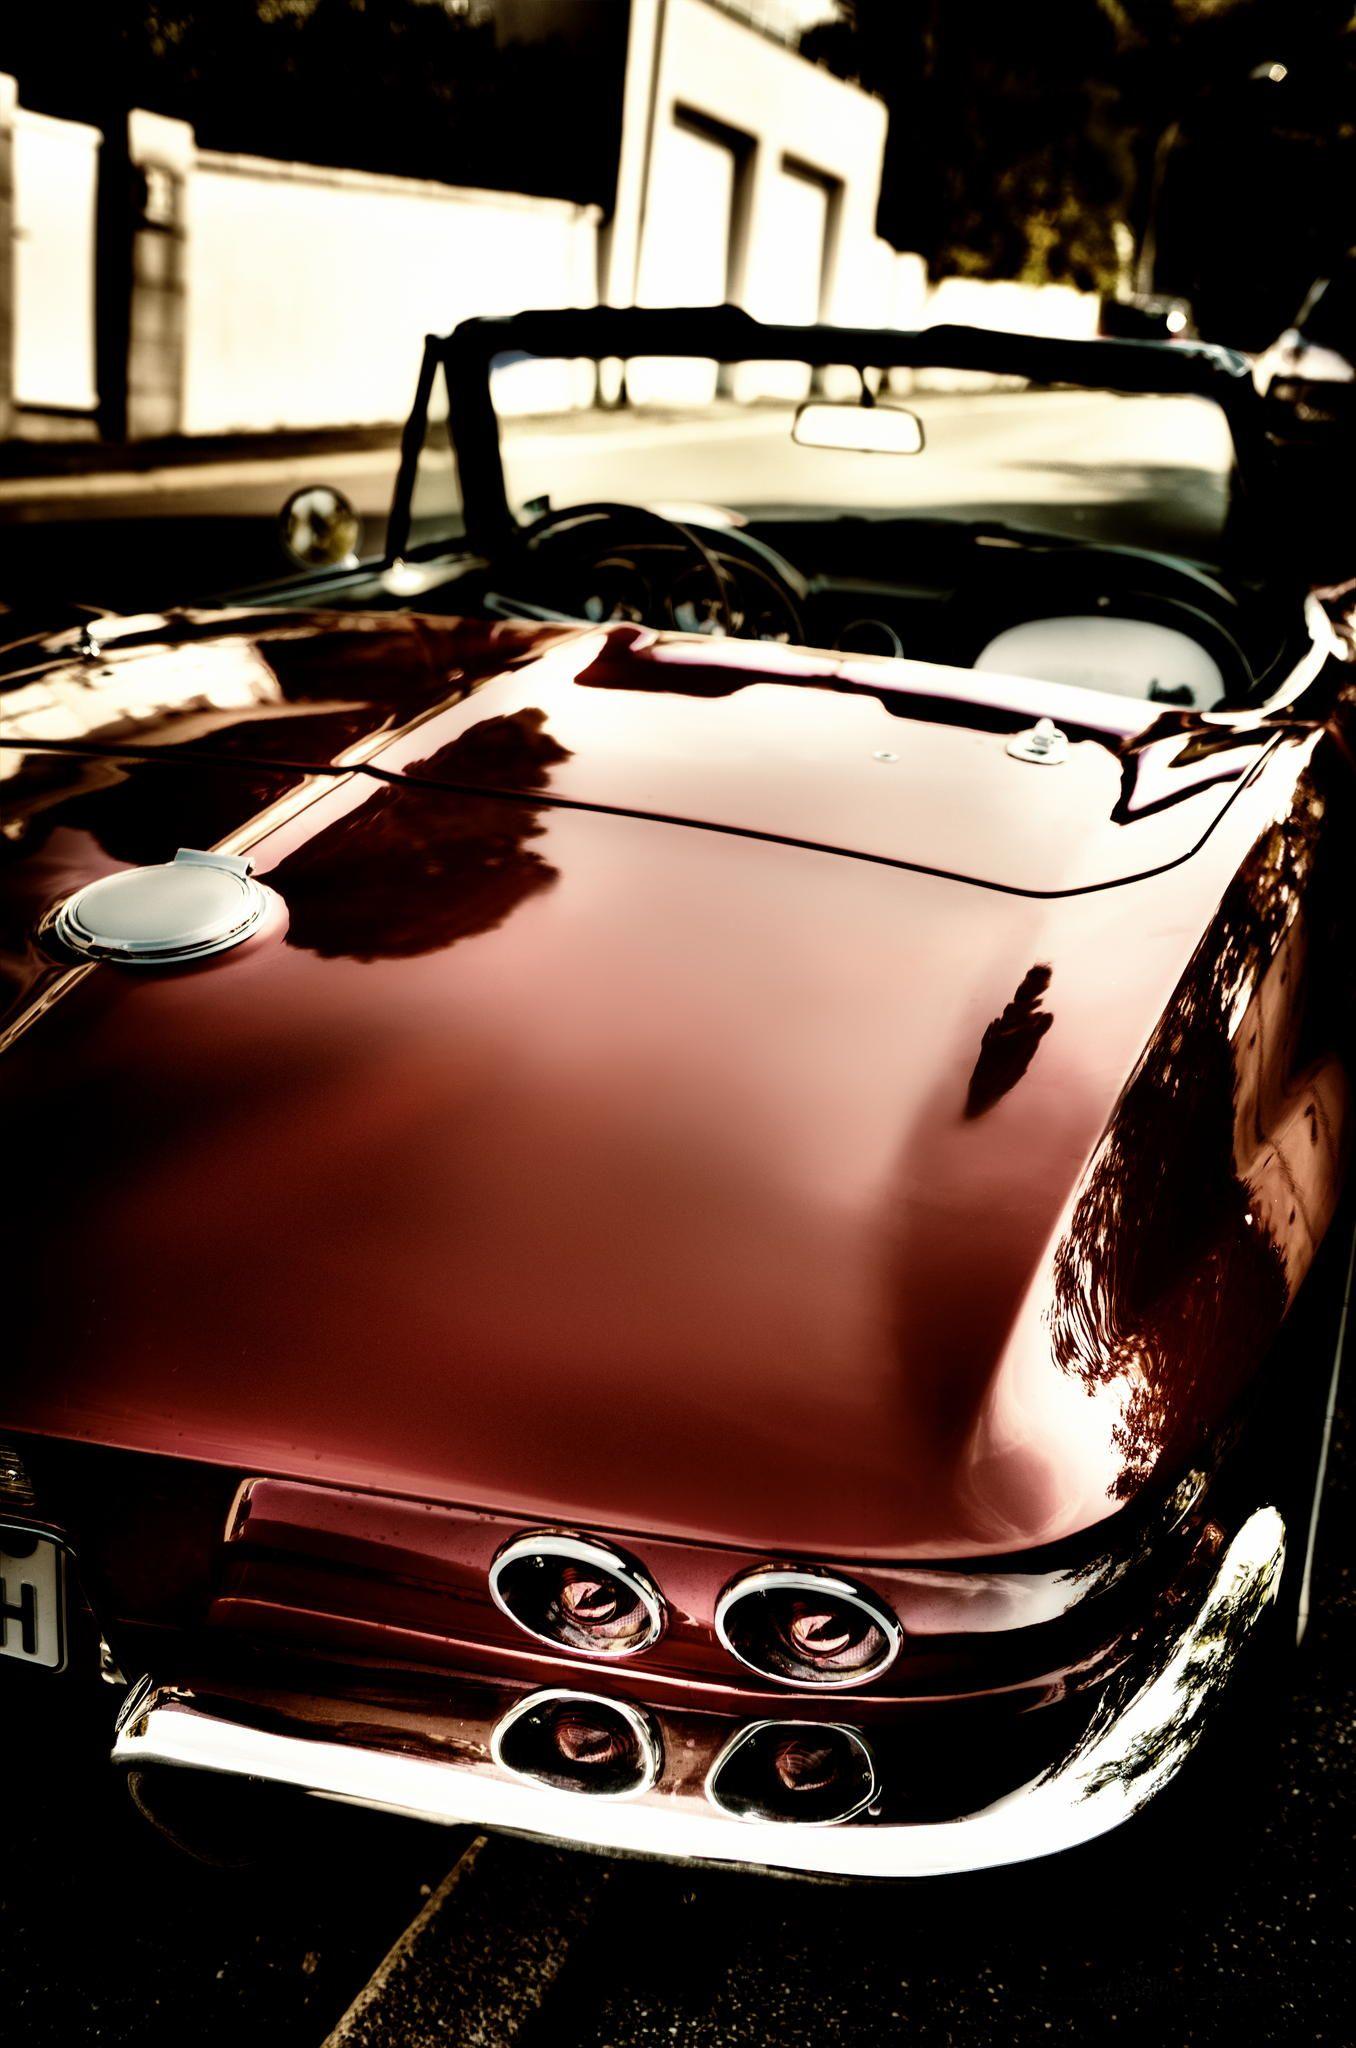 corvette stingray edit by Wolfgang Simm on 500px